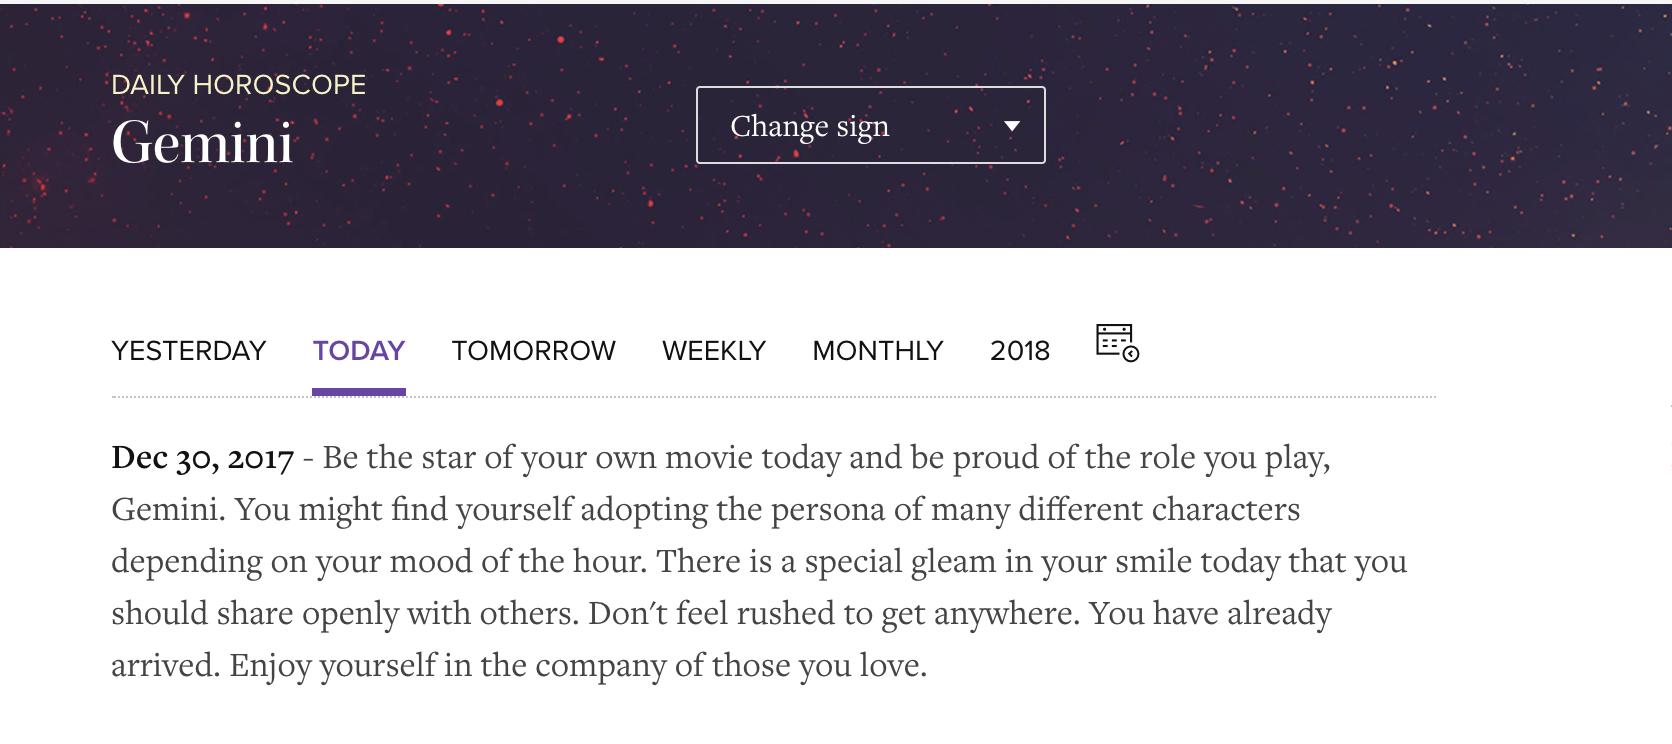 Courtesy of:https://www.horoscope.com/us/horoscopes/general/horoscope-general-daily-today.aspx?sign=3